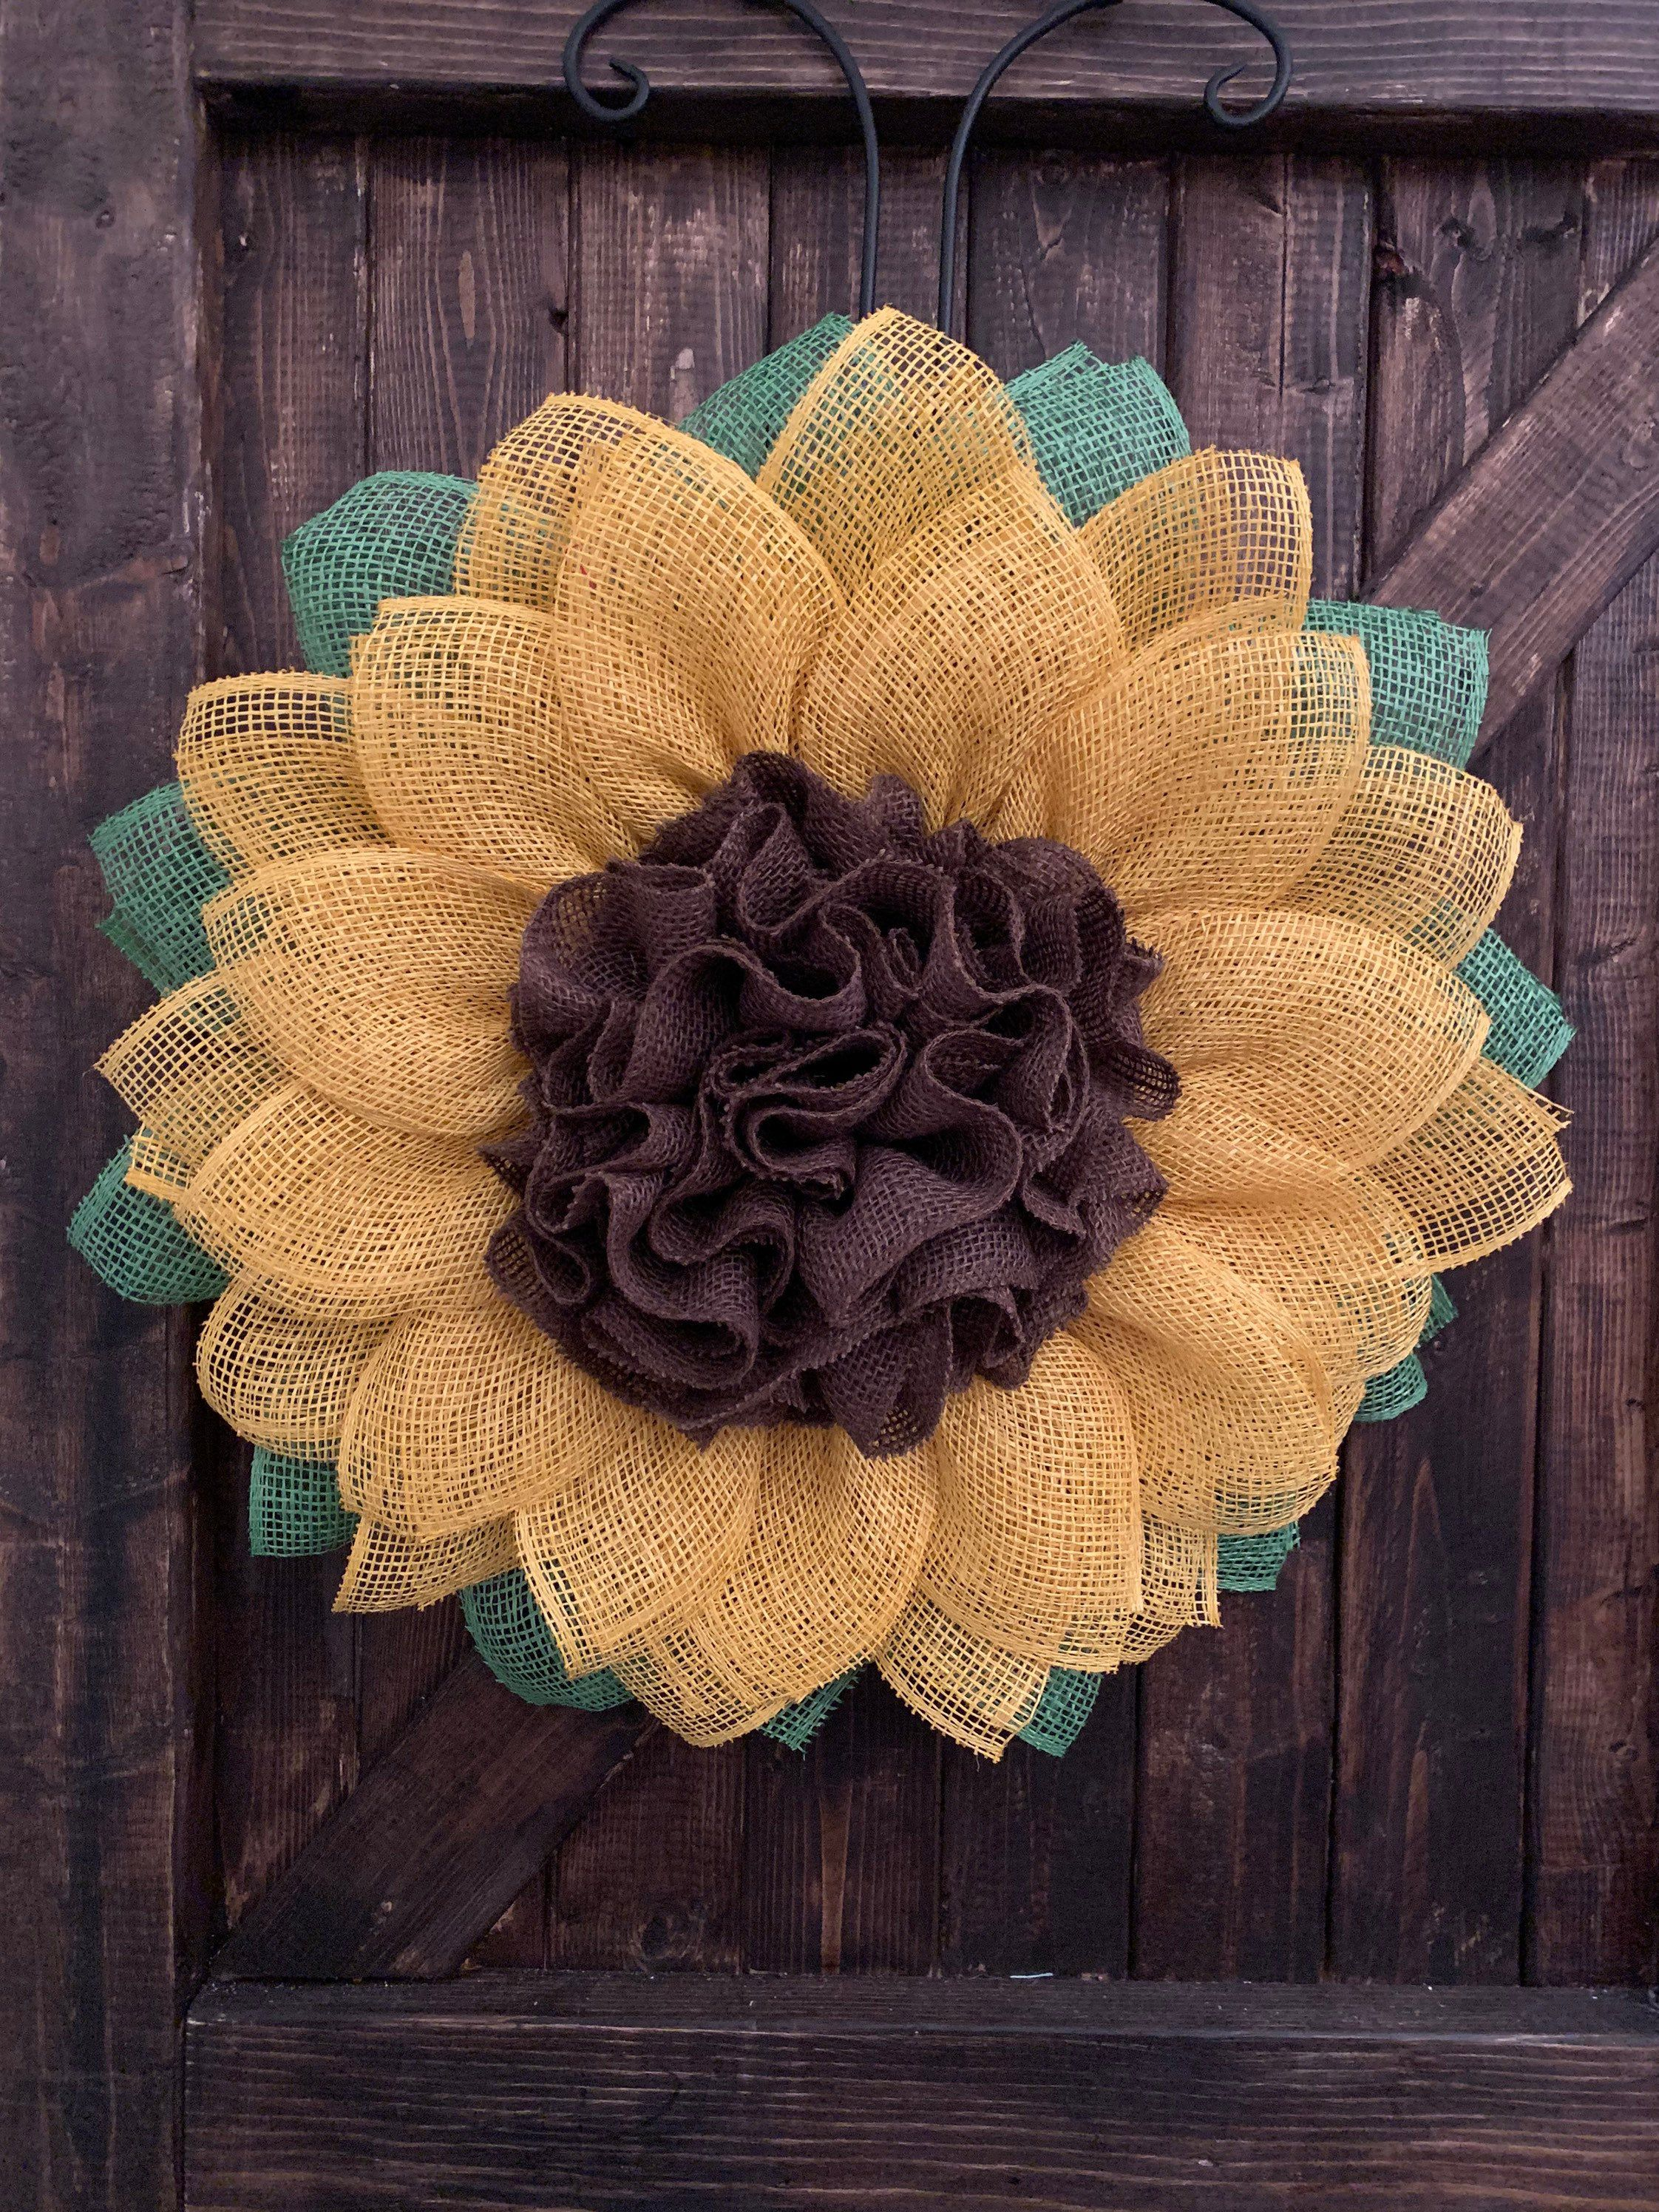 Photo of Sunflower Wreath, Sunflower Decor, Yellow Sunflower, Every day sunflower wreath, Summer Sunflower Wreath, Spring Sunflower Wreath